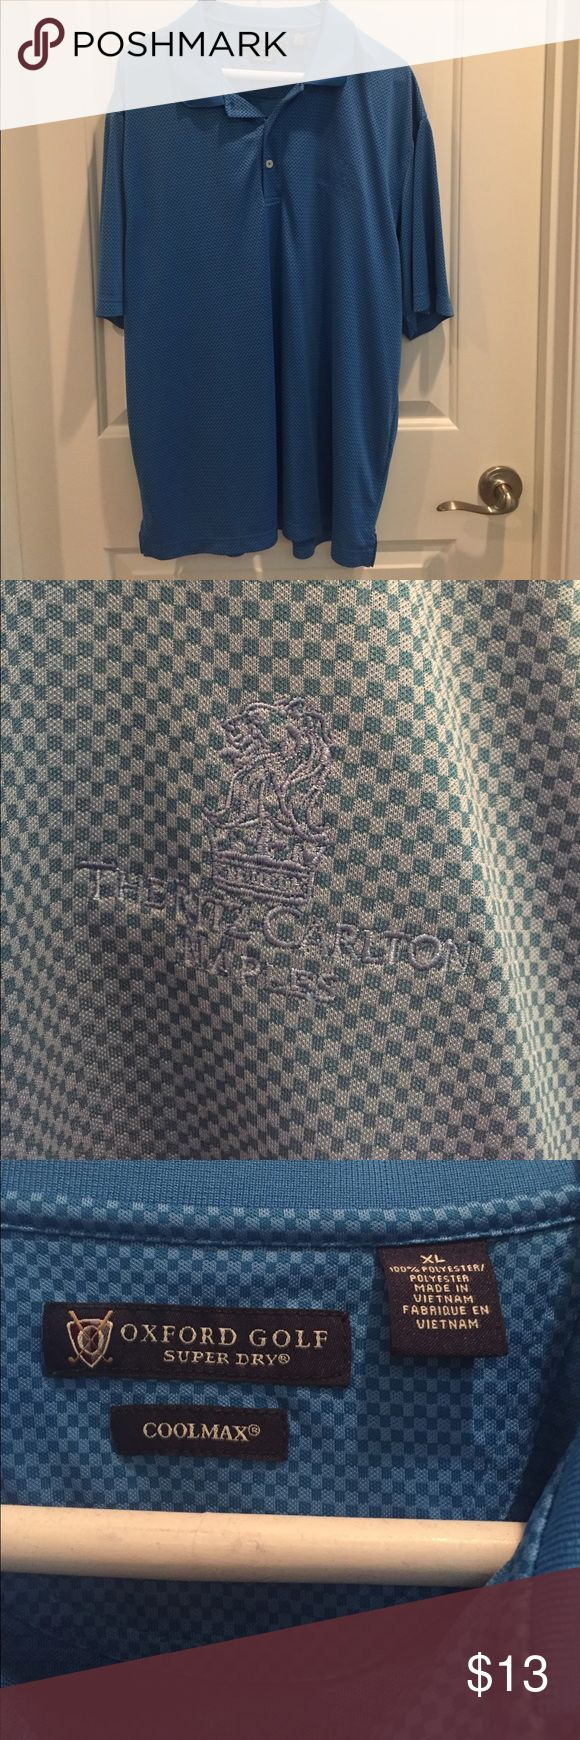 Men's Golf Polo Shirt Men's Golf Polo by Oxford Golf from The Ritz-Carlton in Naples FL size xl Shirts Polos